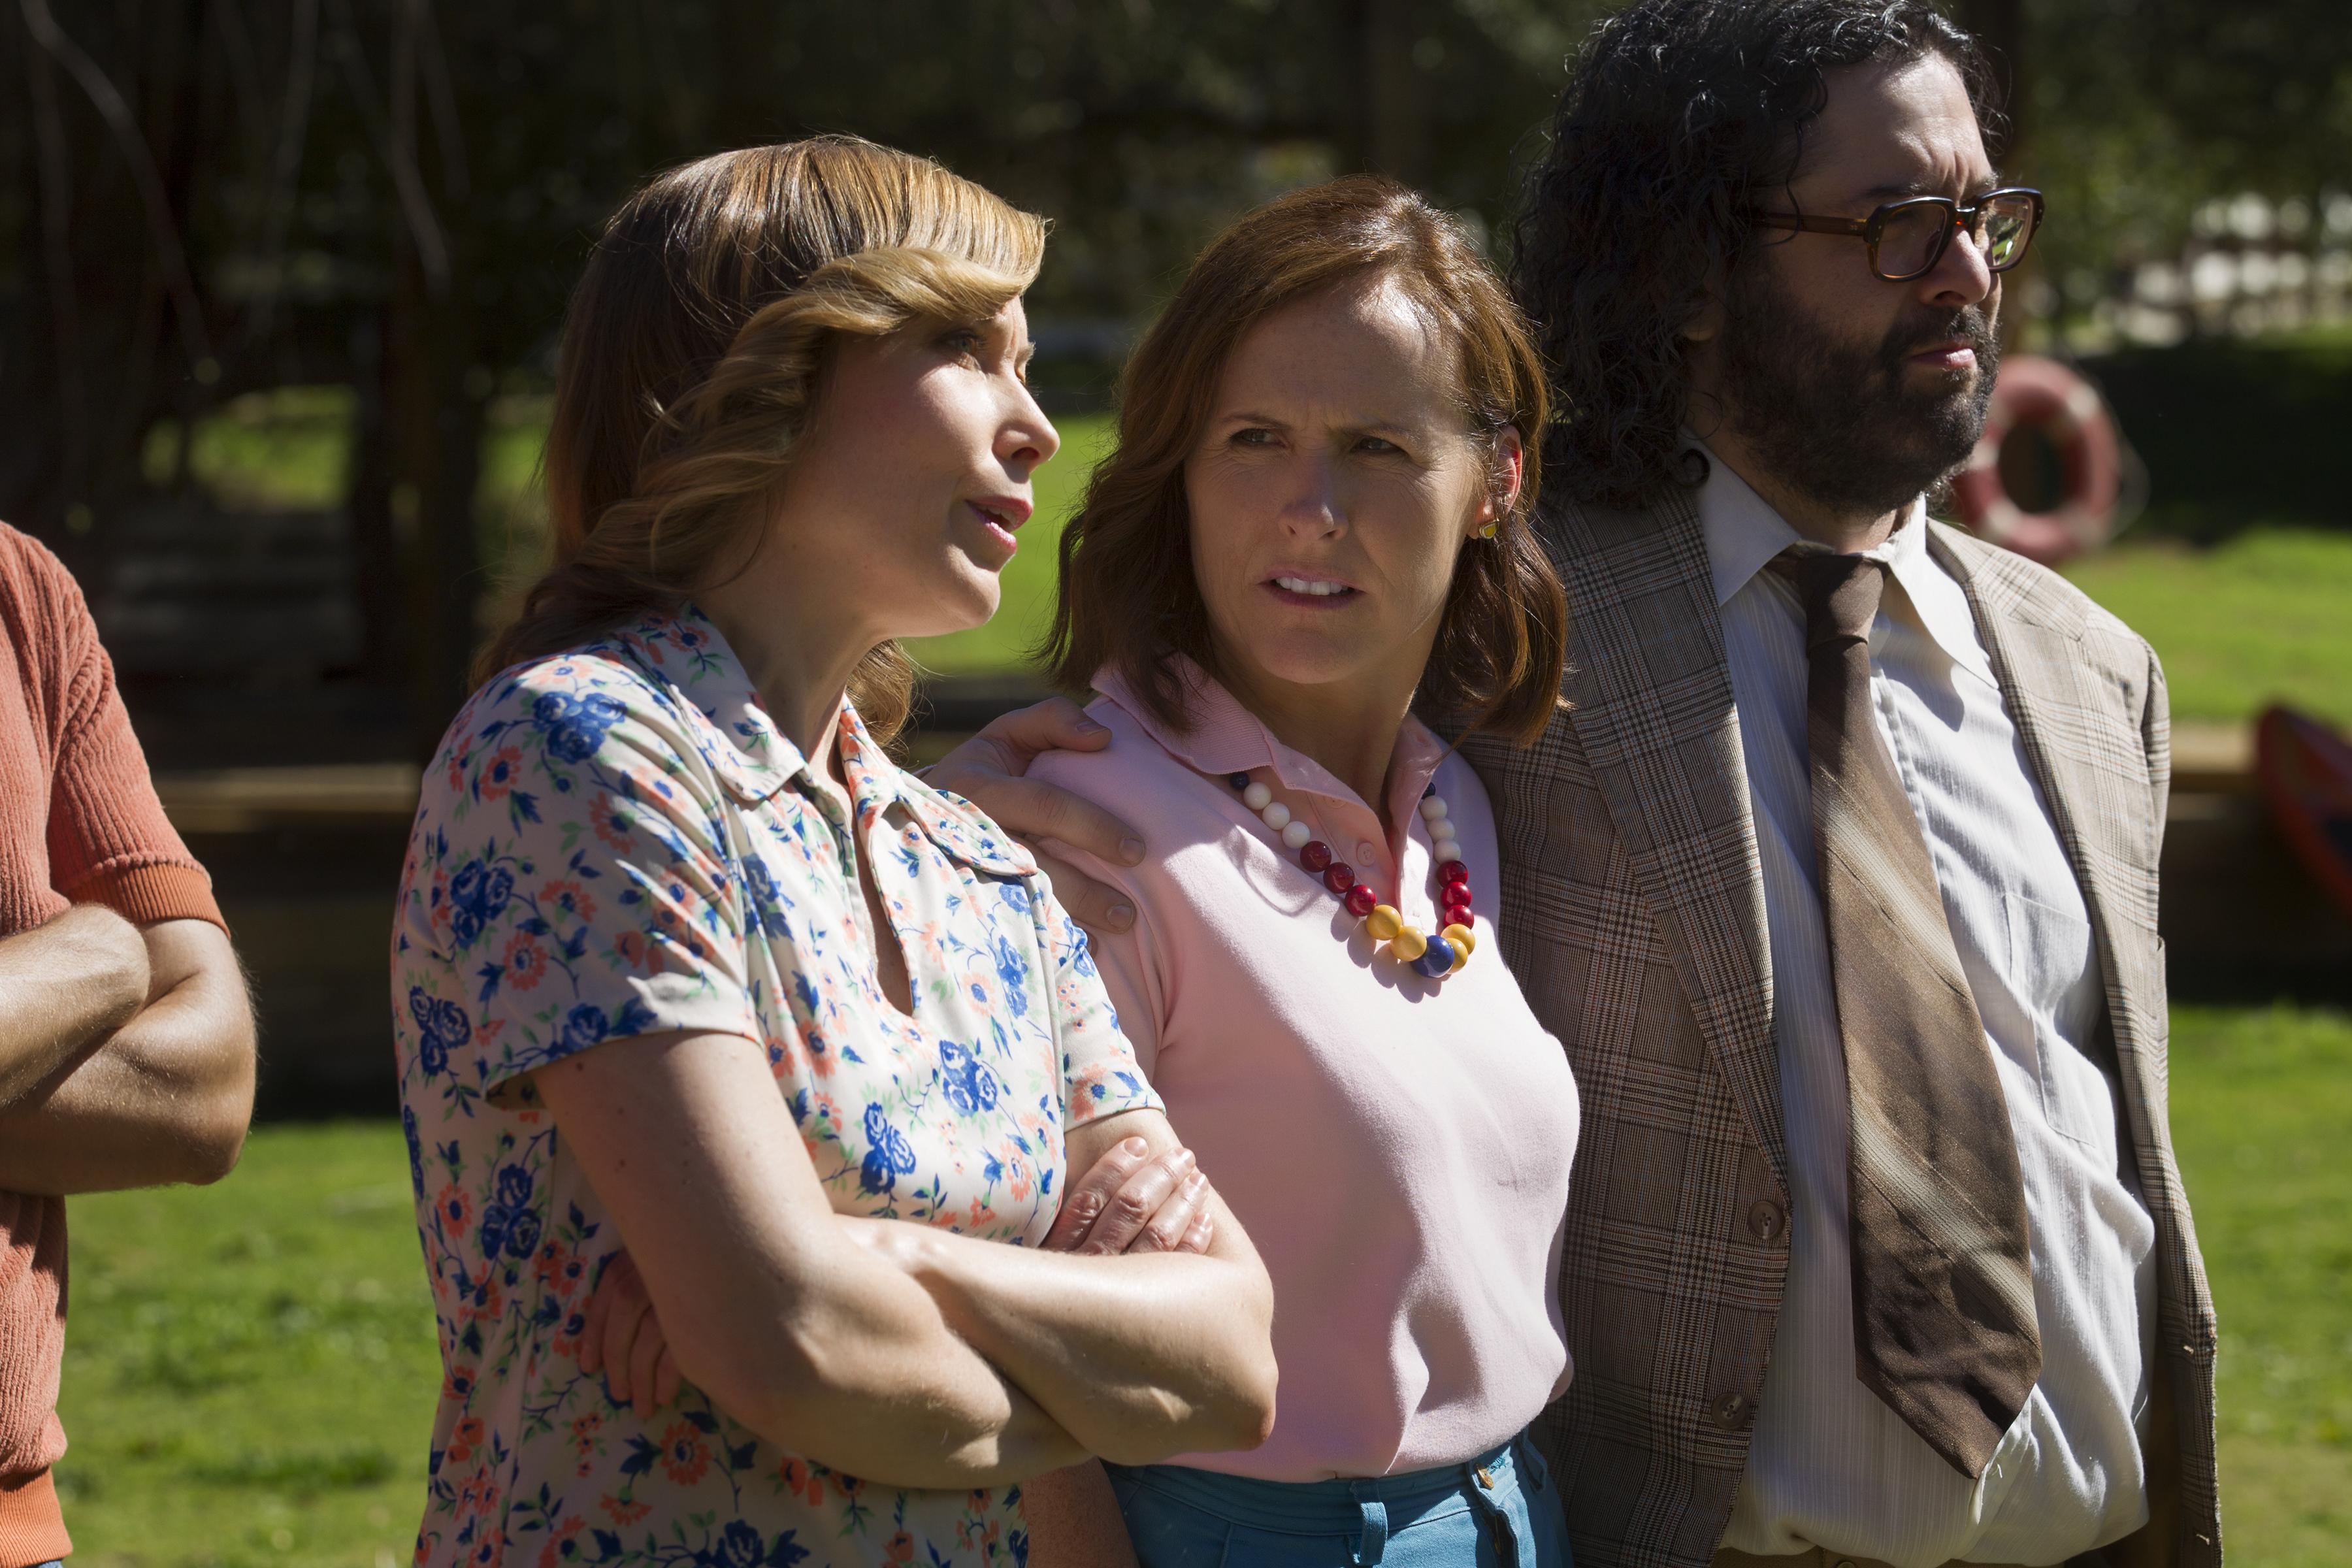 Nina Hellman as Nancy, Molly Shannon as Gail and Judah Friedlander as Ron